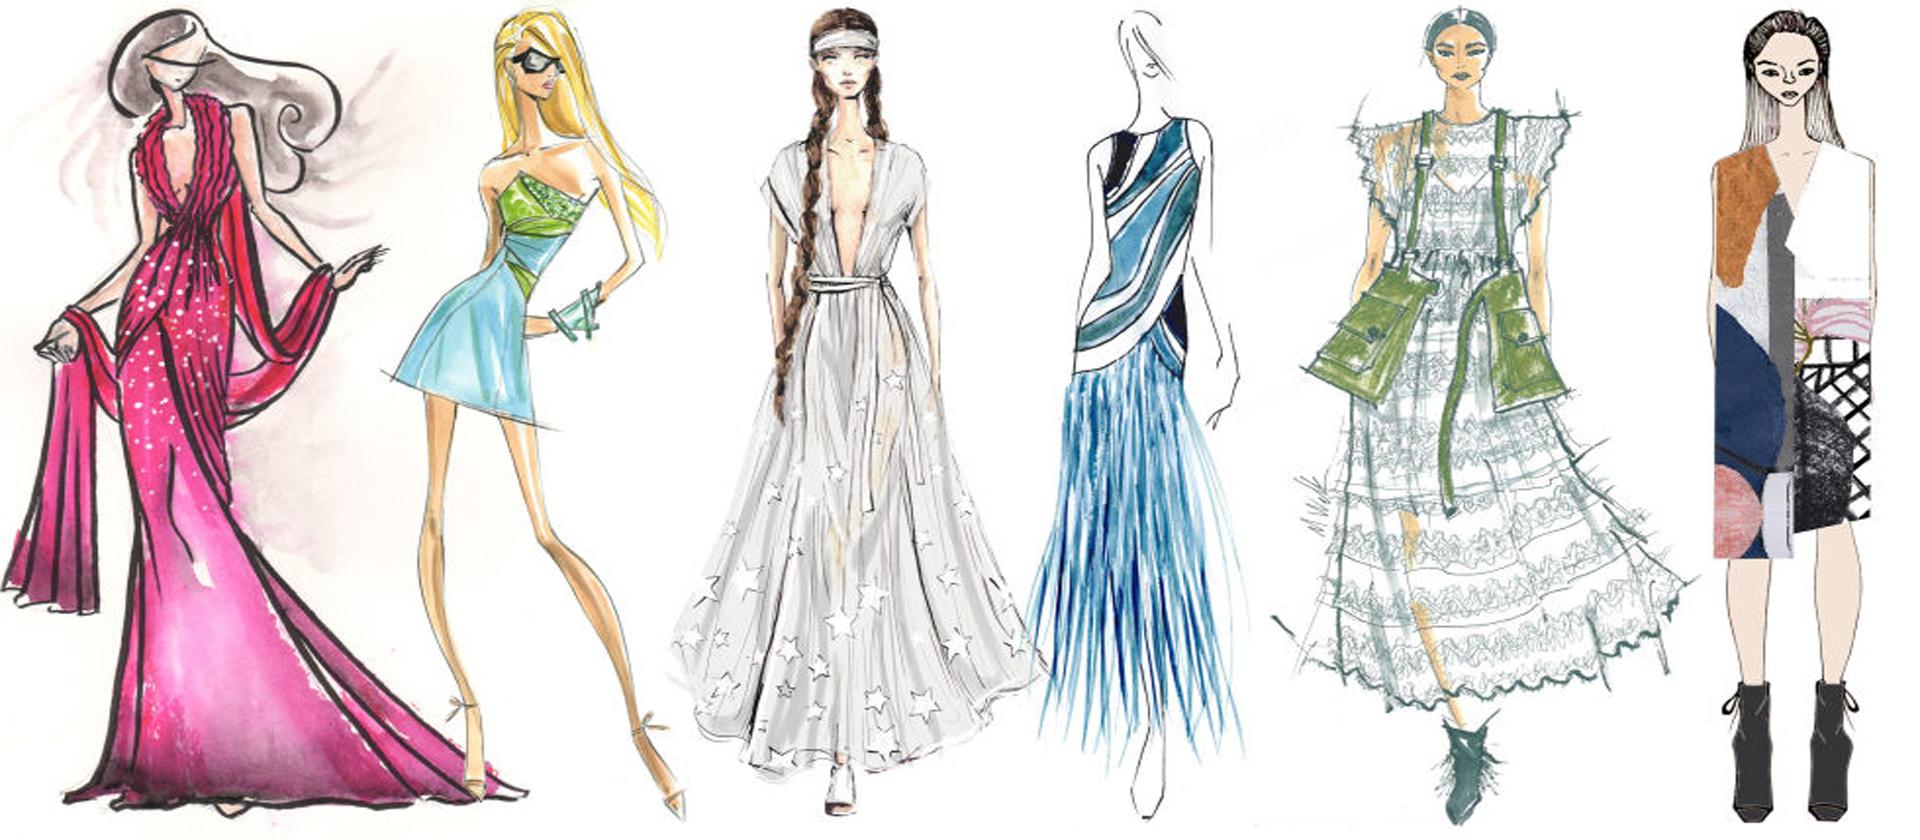 Fashion designing websites like girlsense 97